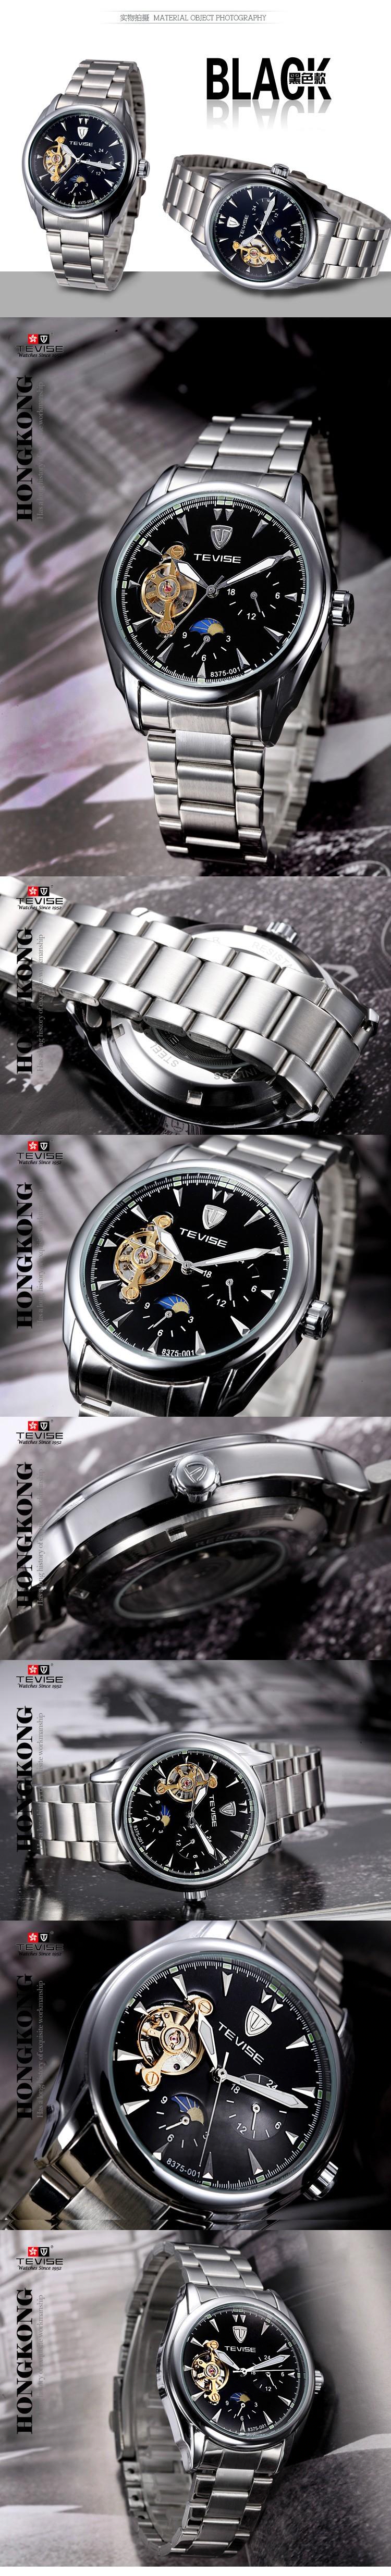 Relojes Hombre Бренд Часы Tourbillon Часы Мужчины Полный сталь Ремешок Механические Часы Мода Повседневная Мужчины Наручные Часы Мужчин Horloge